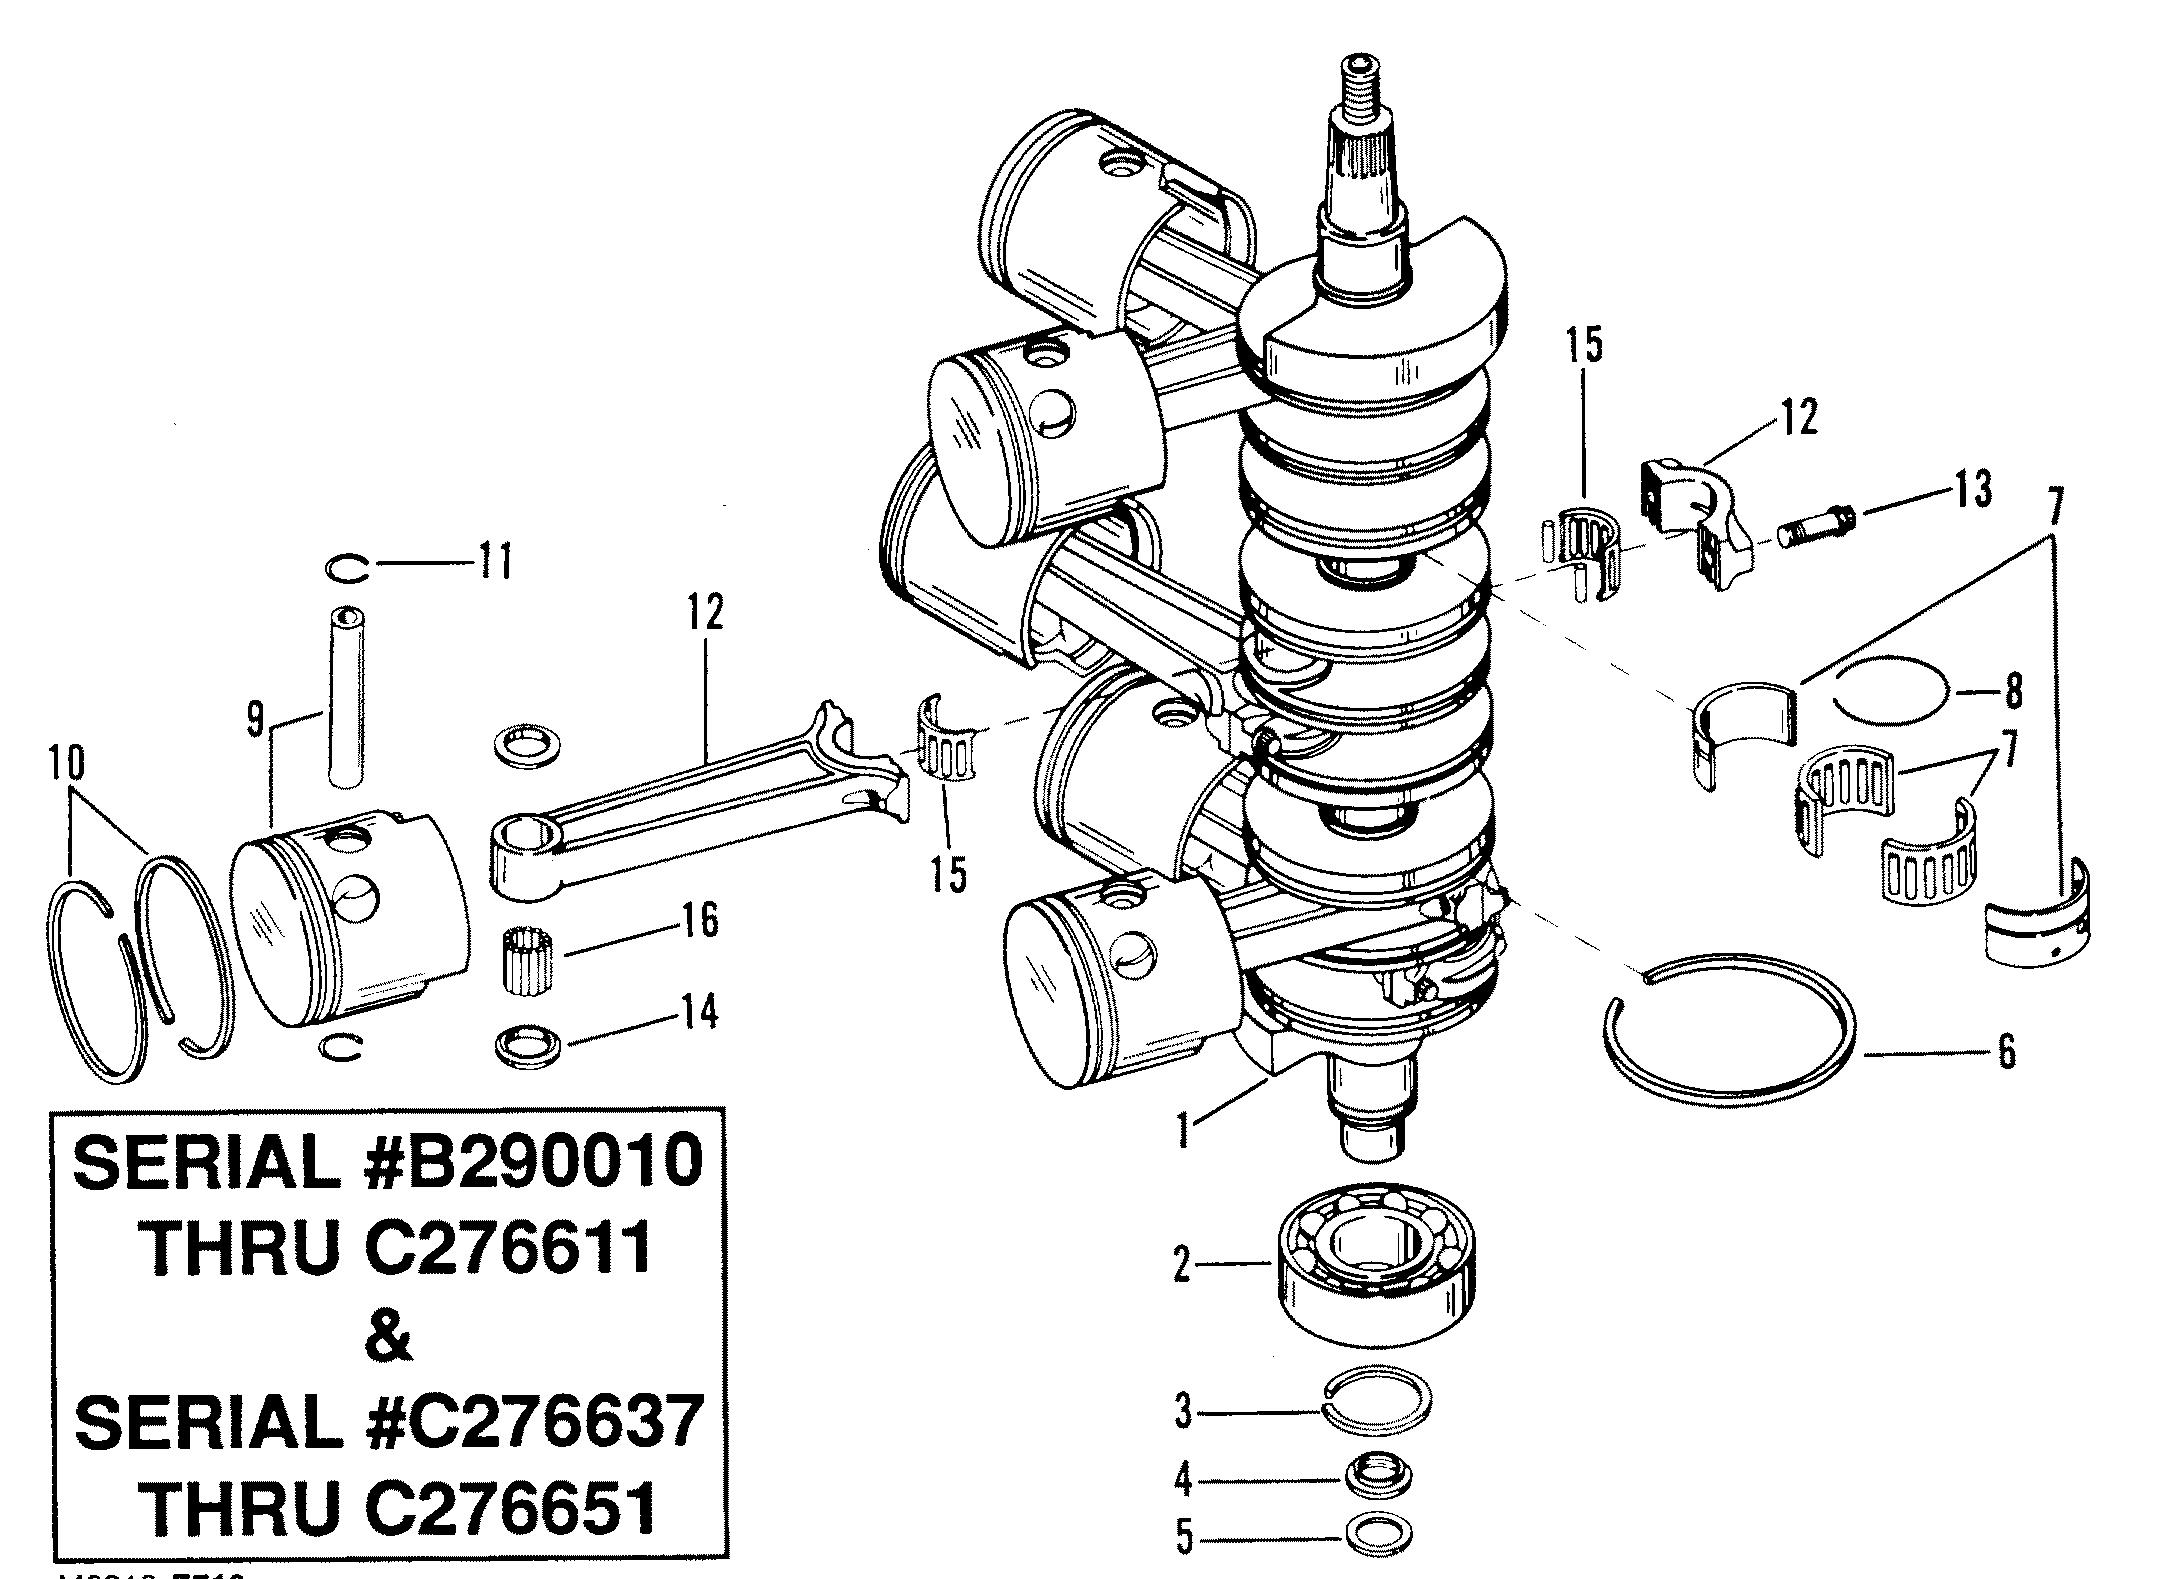 Каталог запчастей race outboard merc mar 2 4l (efi) 0b290010 thrucrankshaft, pistons and connecting rods